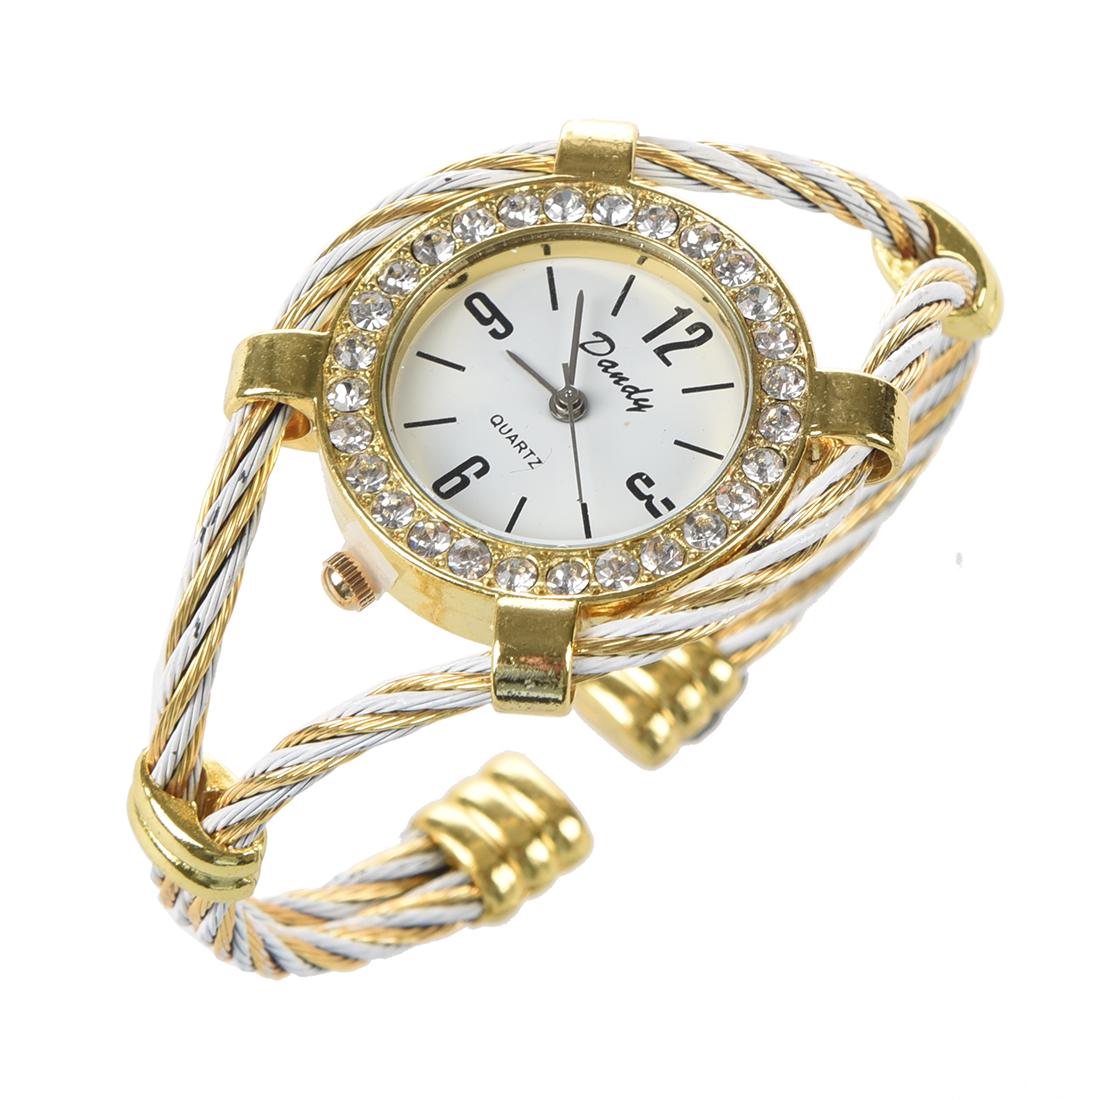 Gold Wrist Bracelet: H1 Gold Tone Rope Lady Rhinestone Wrist Watch Bangle